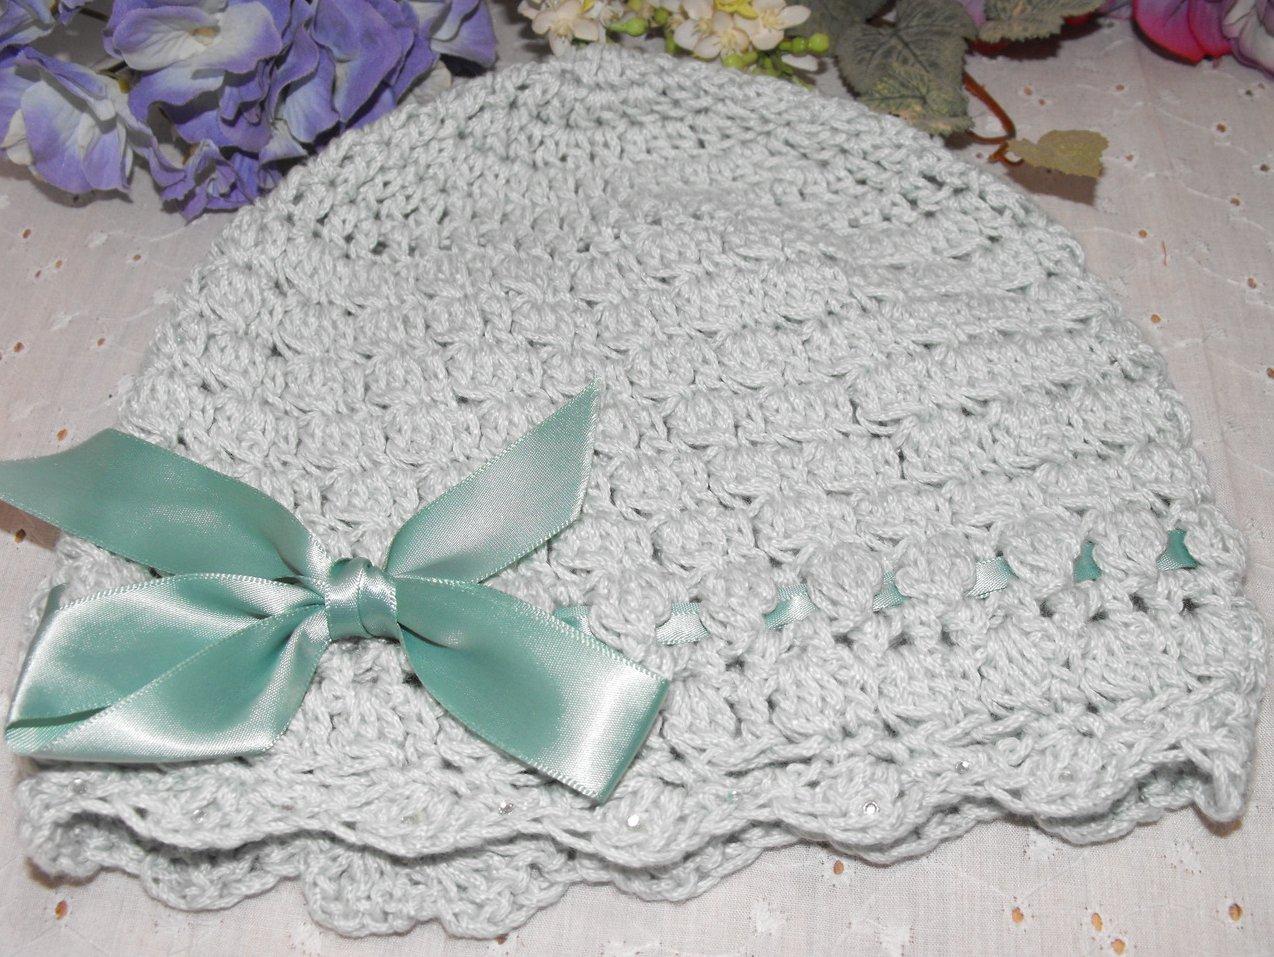 Crocheted Cloche Hat Cap Girl's Mint Green Handcrafted Rhinestones